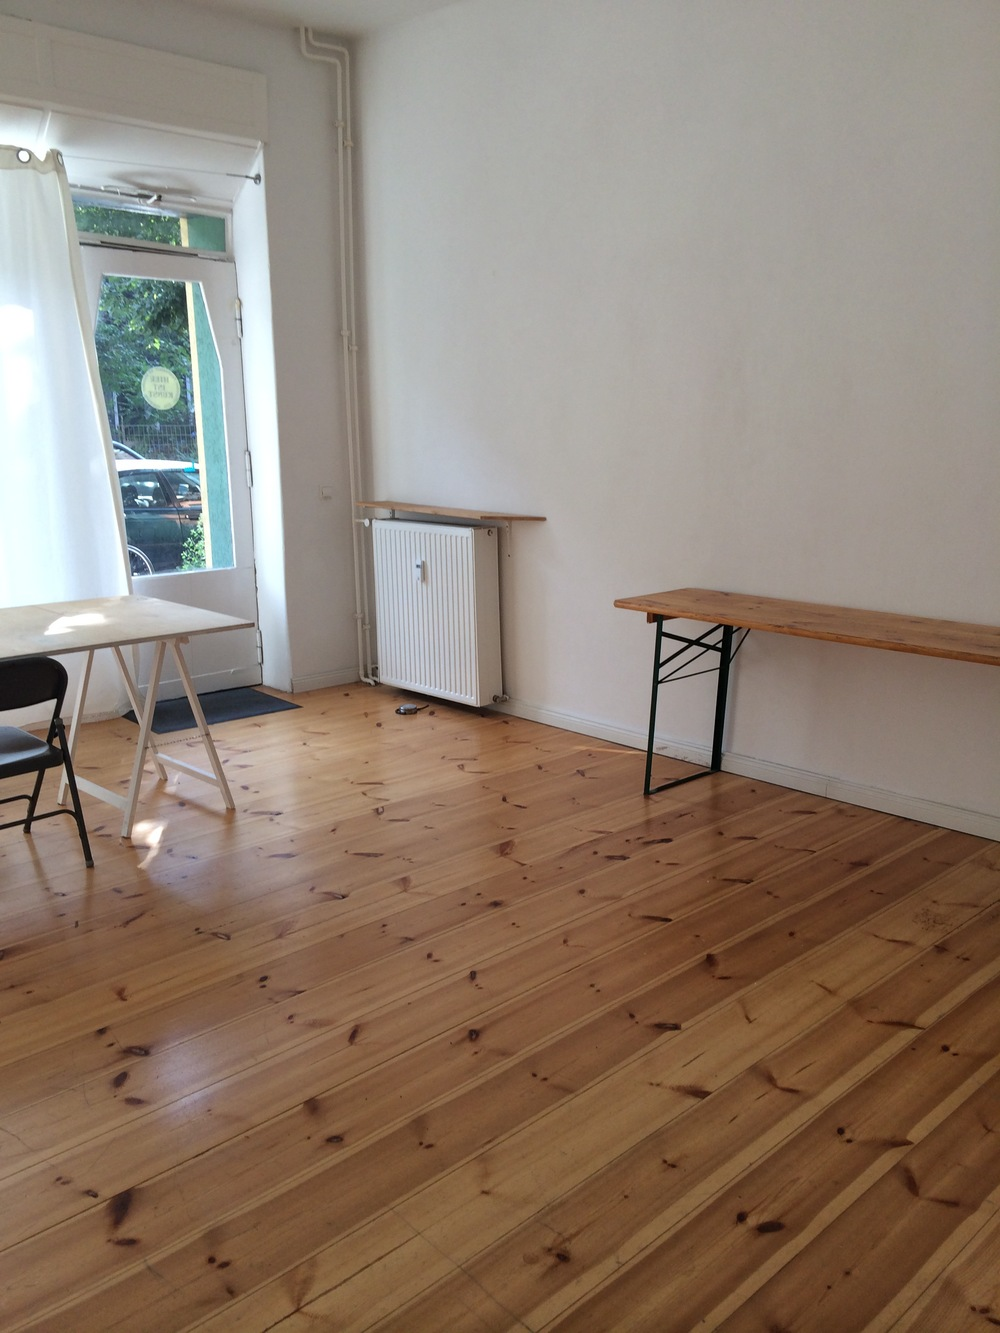 Studio Space in front